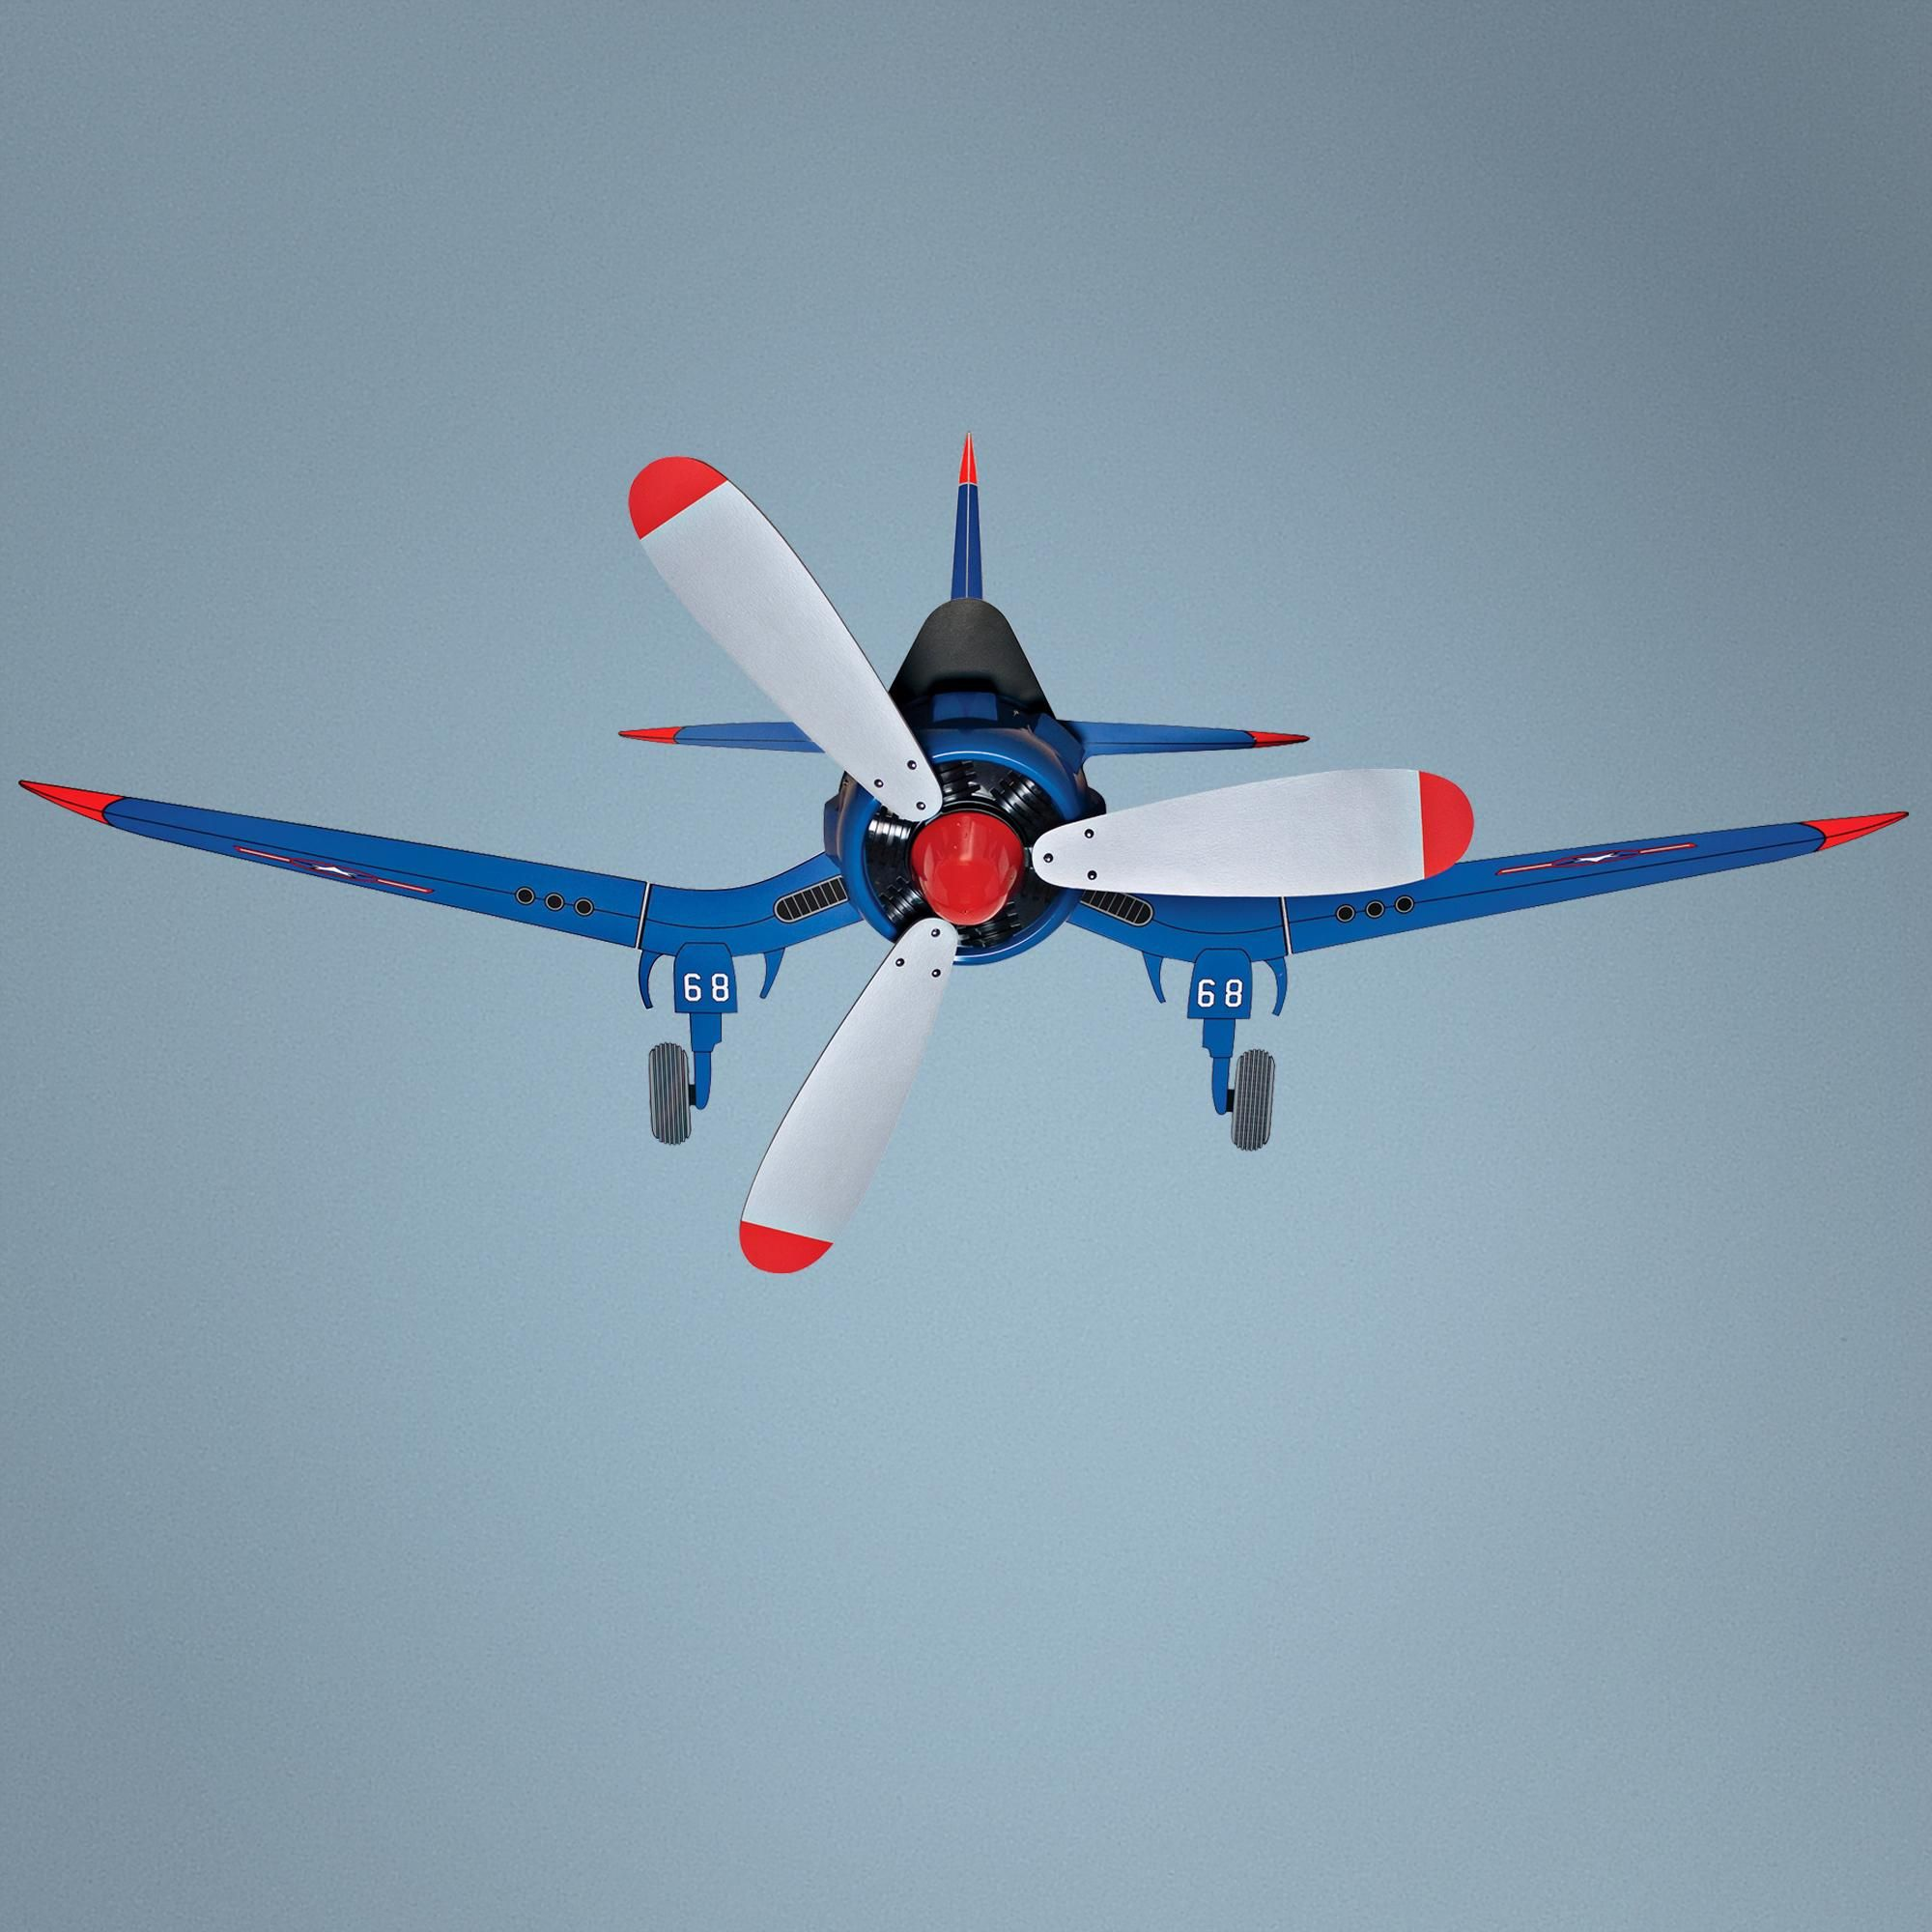 "48"" Fantasy Flyer Airplane Ceiling Fan - for Hogans room ..."